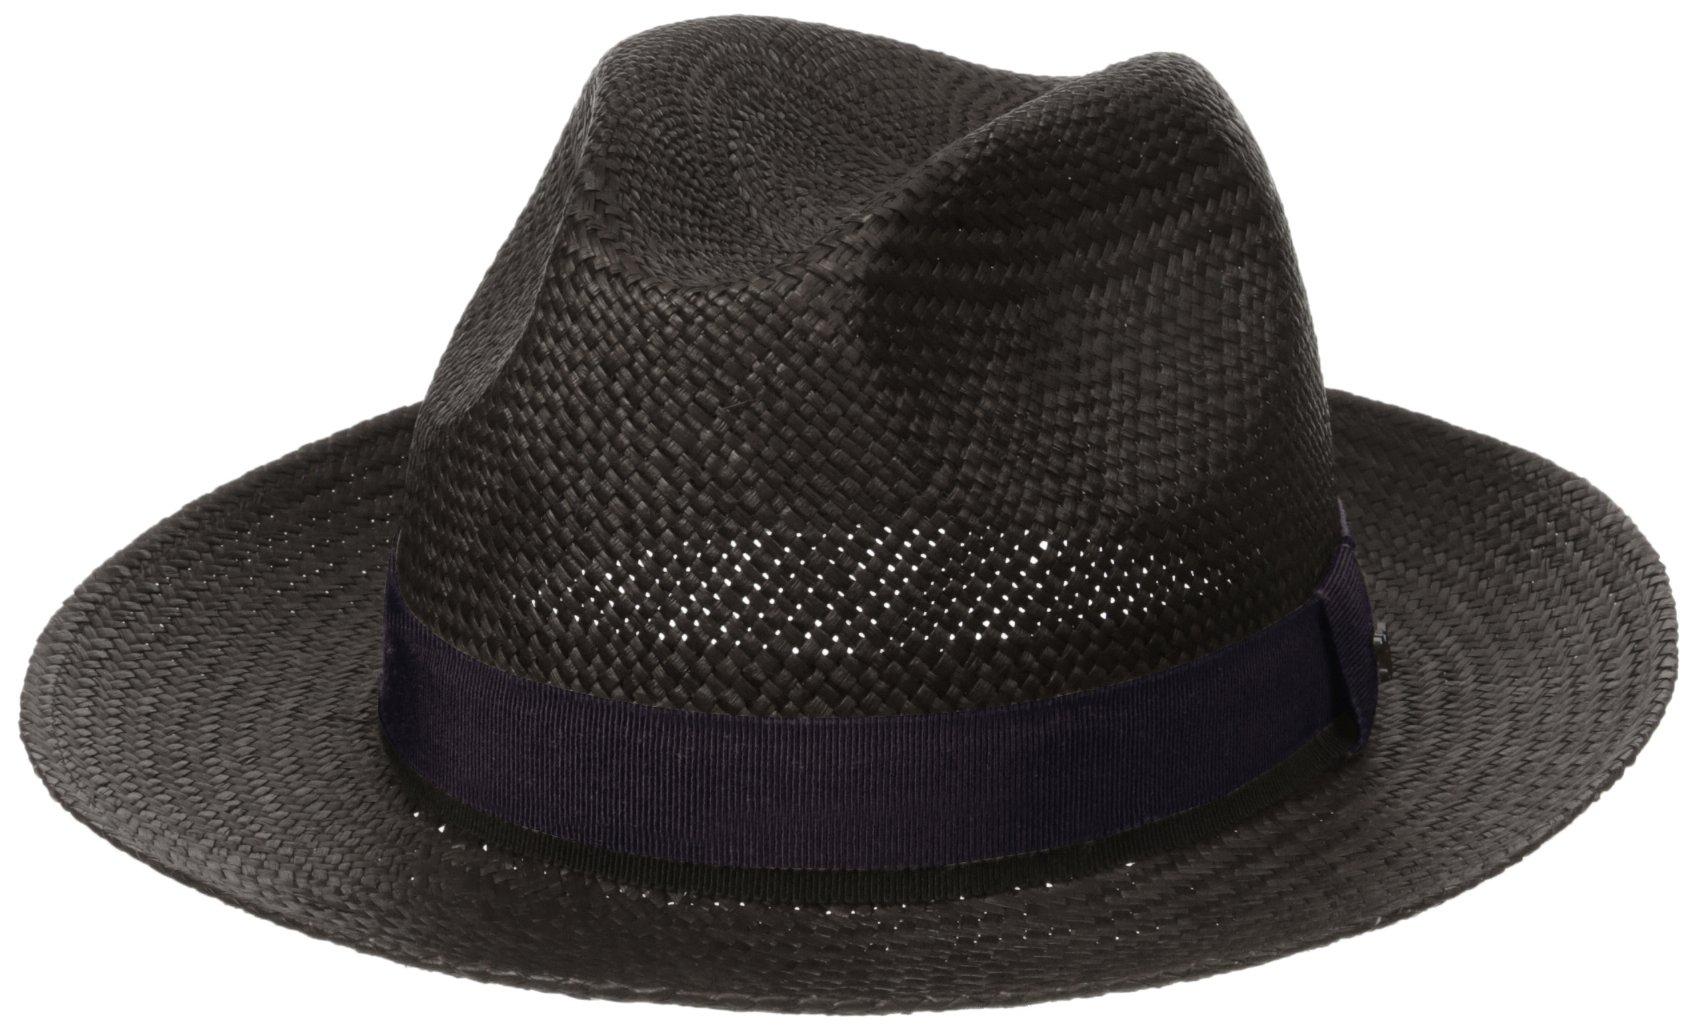 Hickey Freeman Men's Straw Fedora Hat, Blue 59